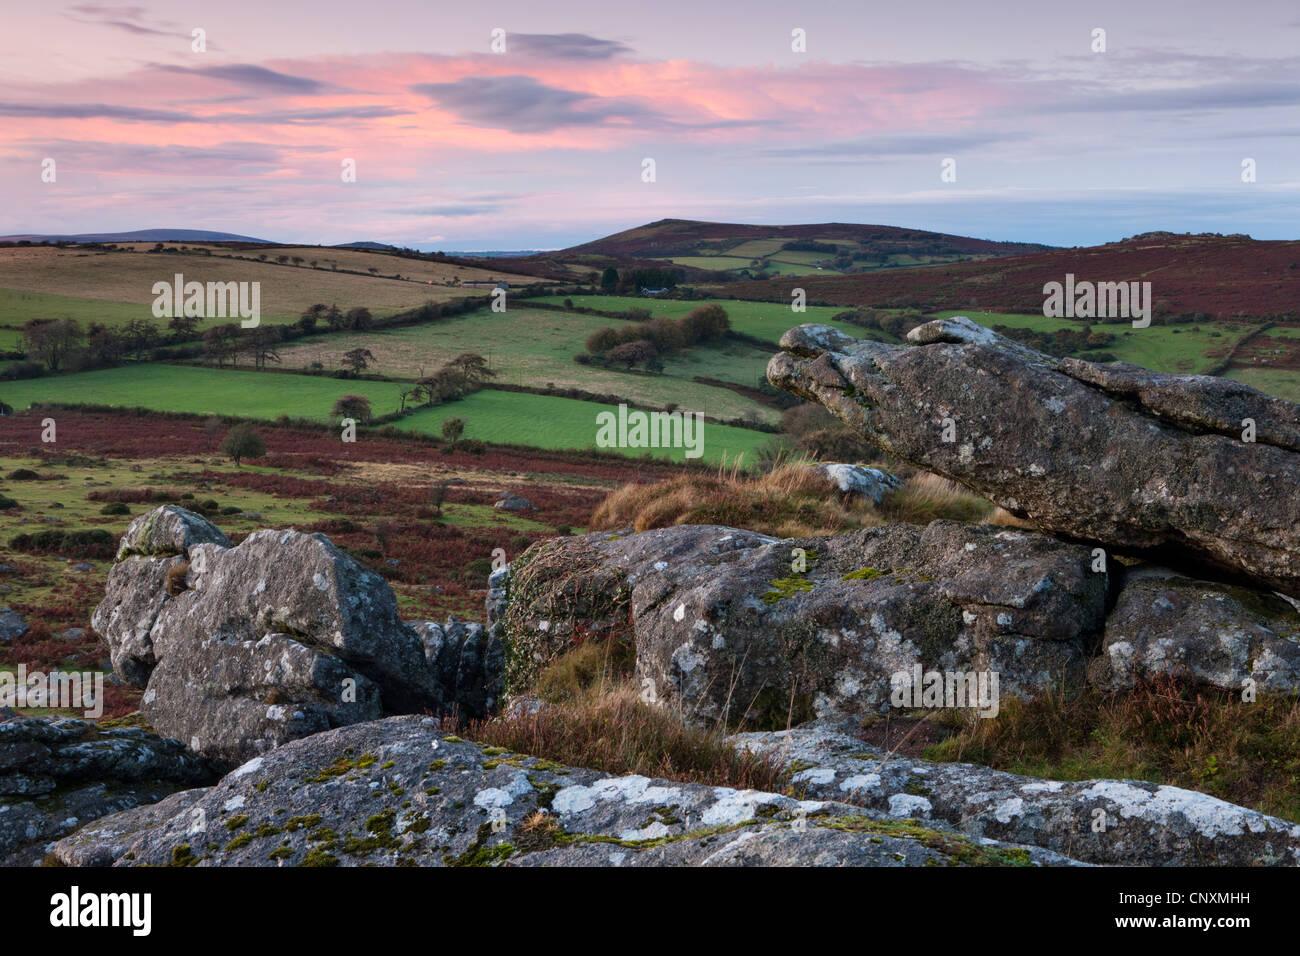 Plus de Twilight vu de campagne Dartmoor Hound Tor, Dartmoor, dans le Devon, Angleterre. L'automne (octobre) Photo Stock